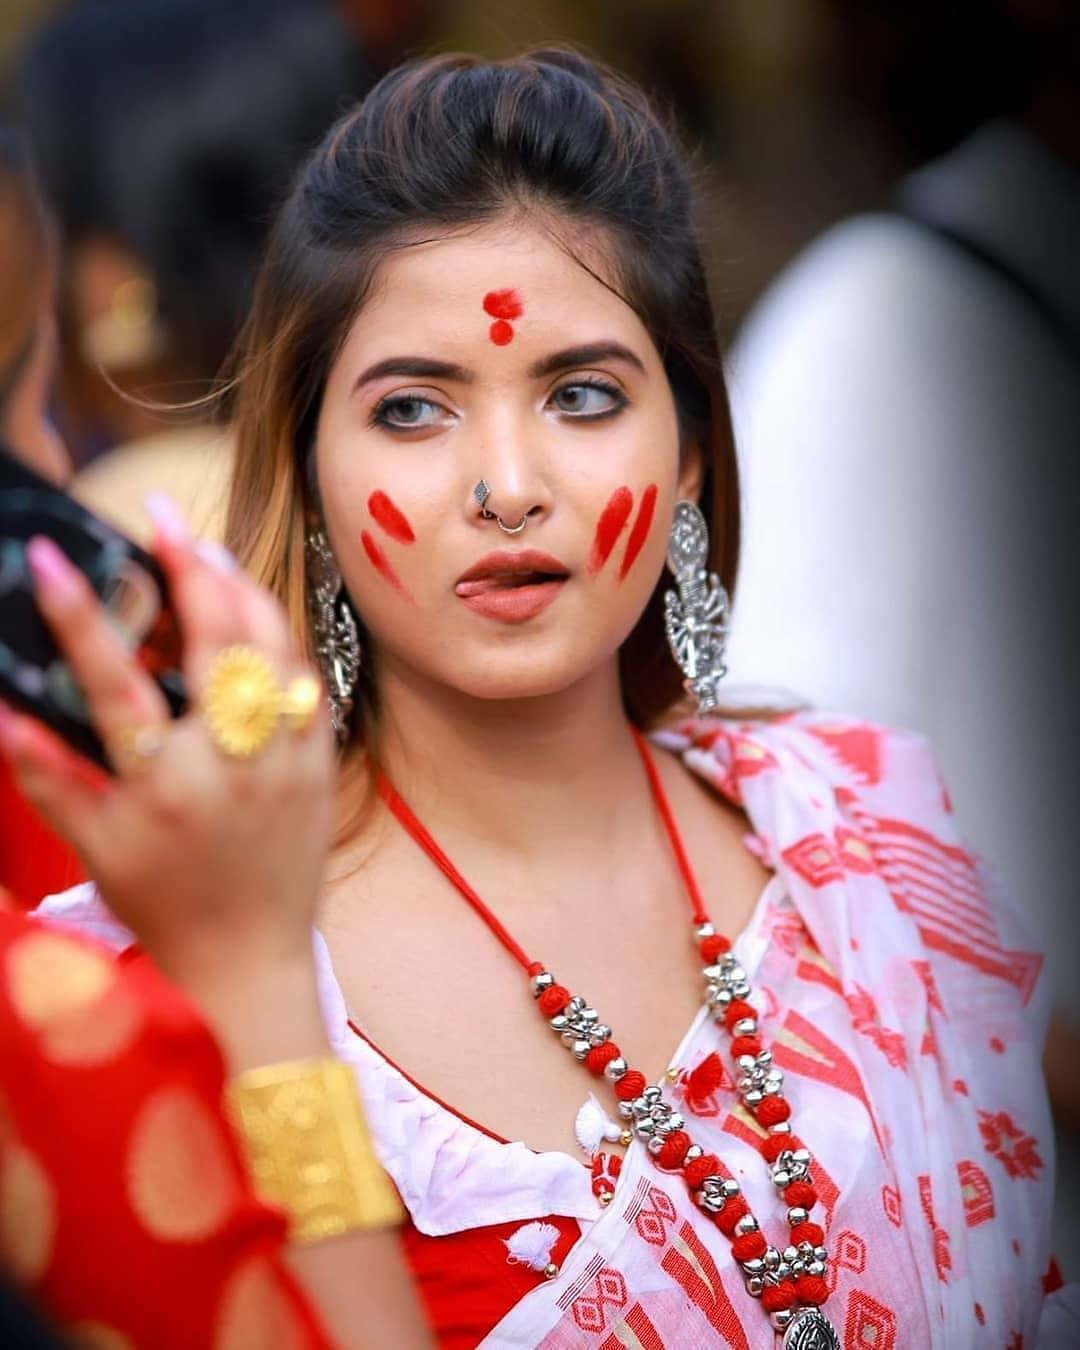 Desi girl pic